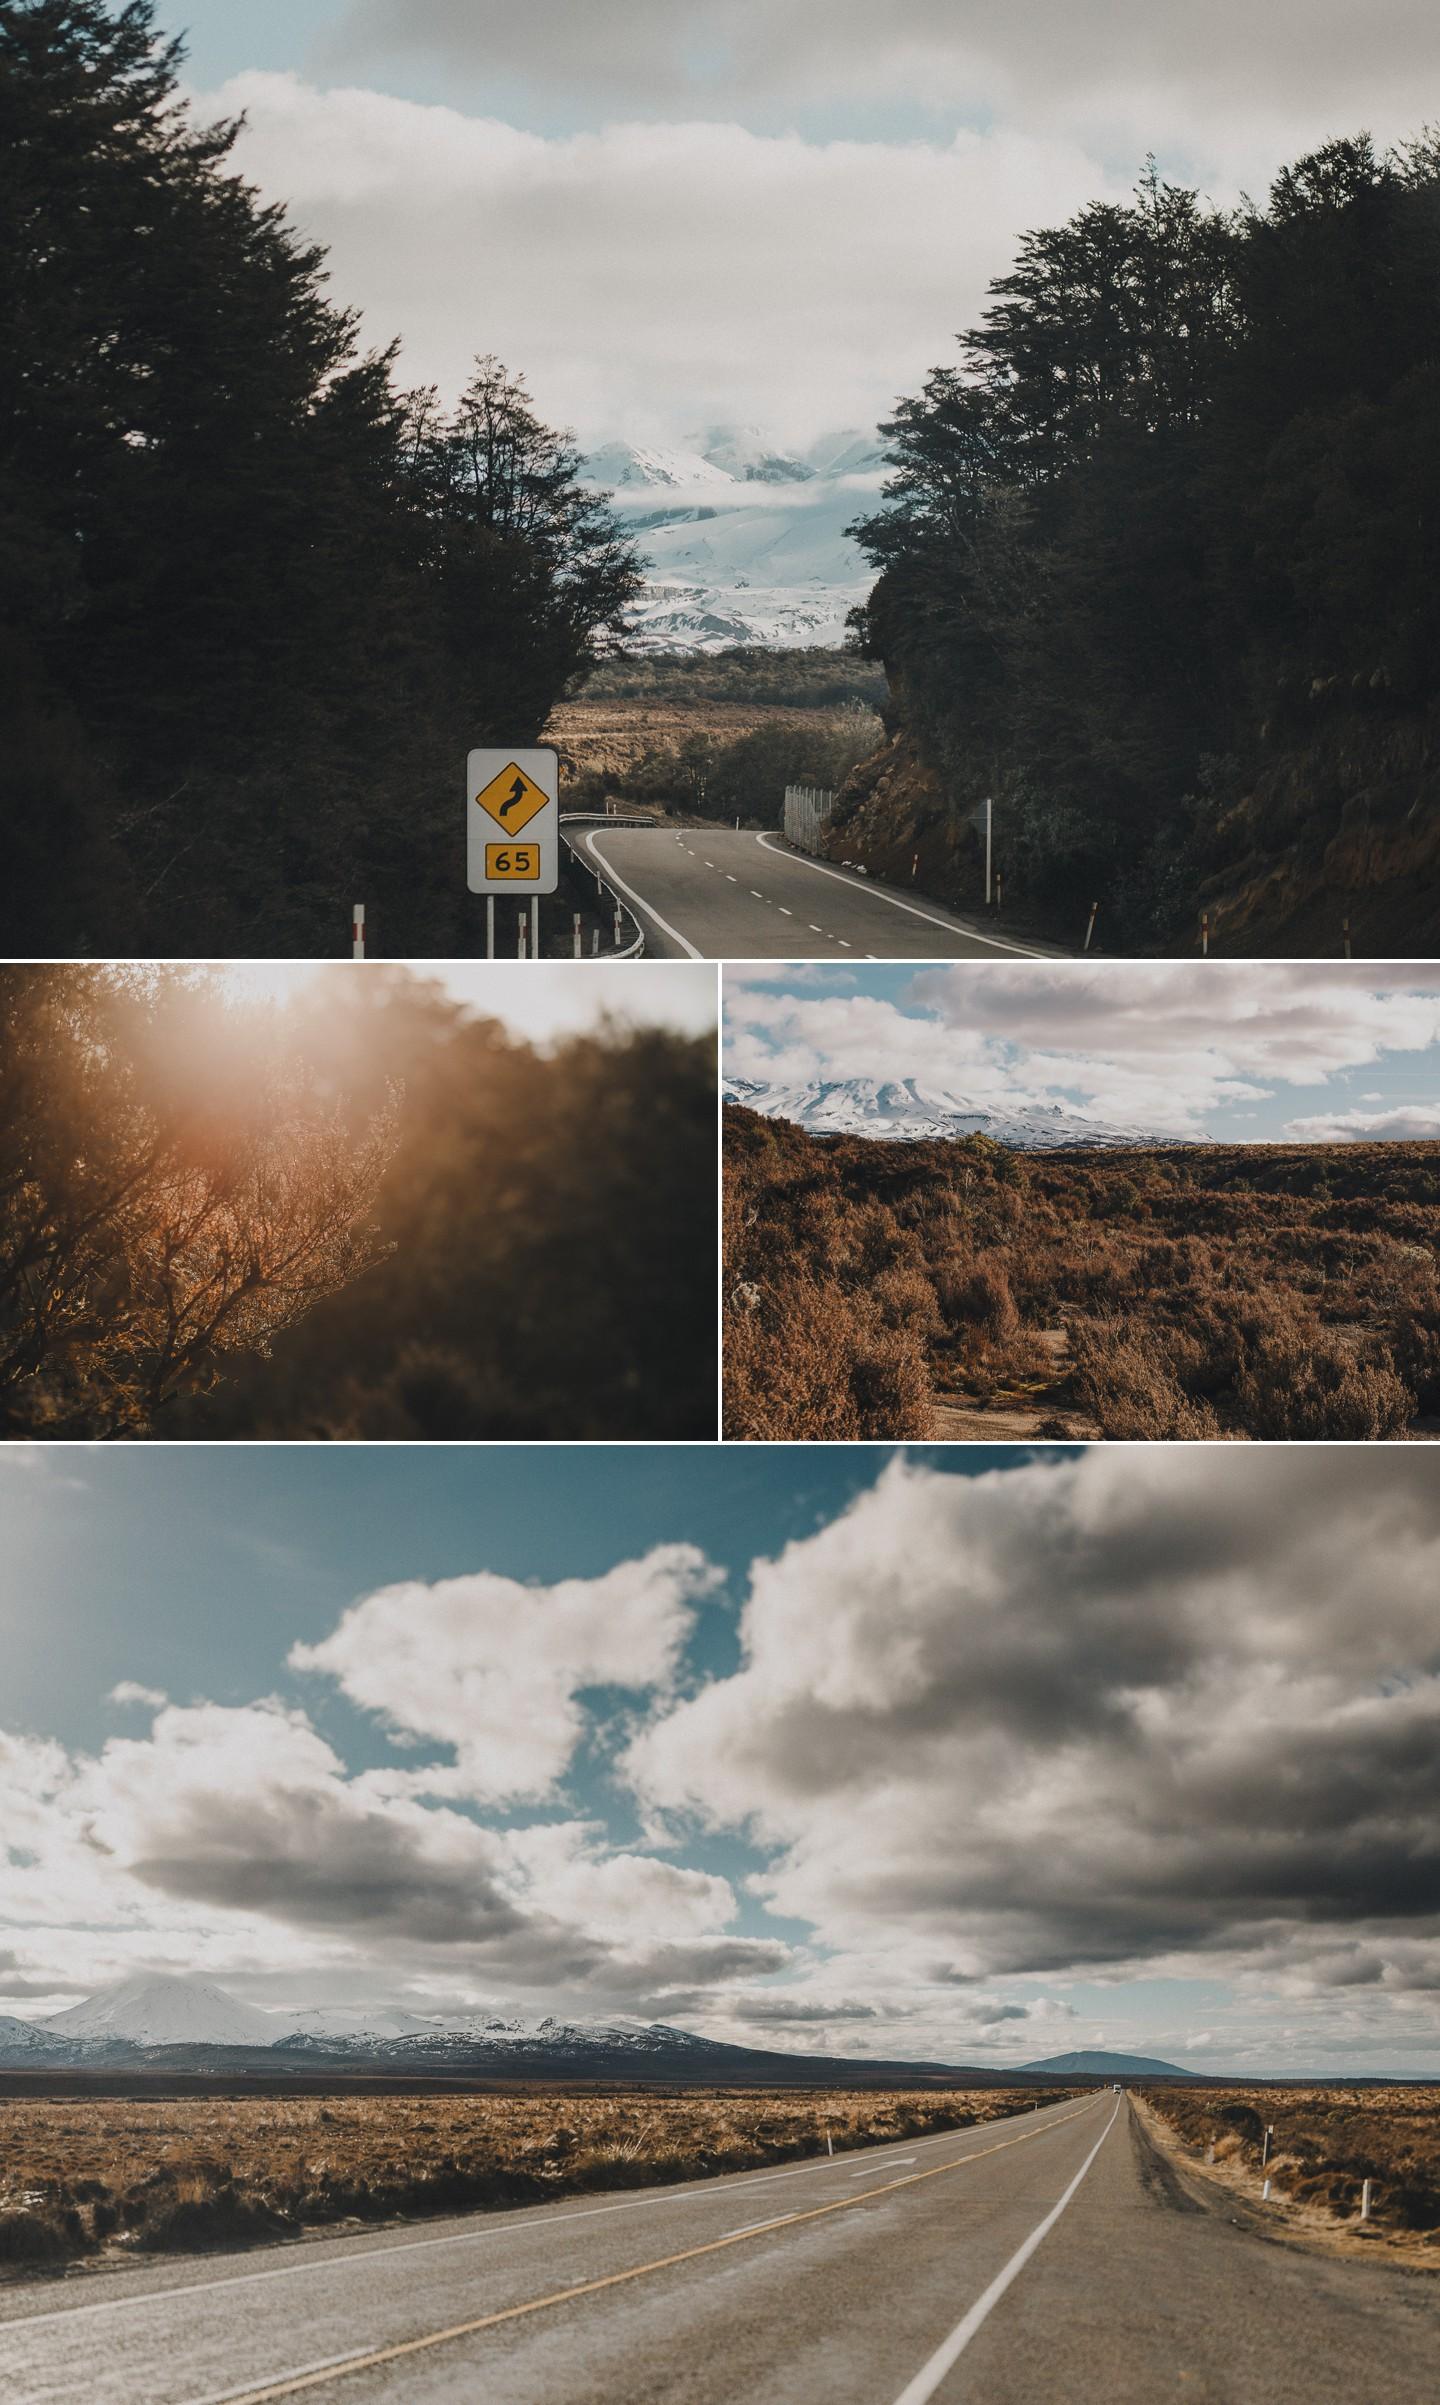 New Zealand roadtrip desert road